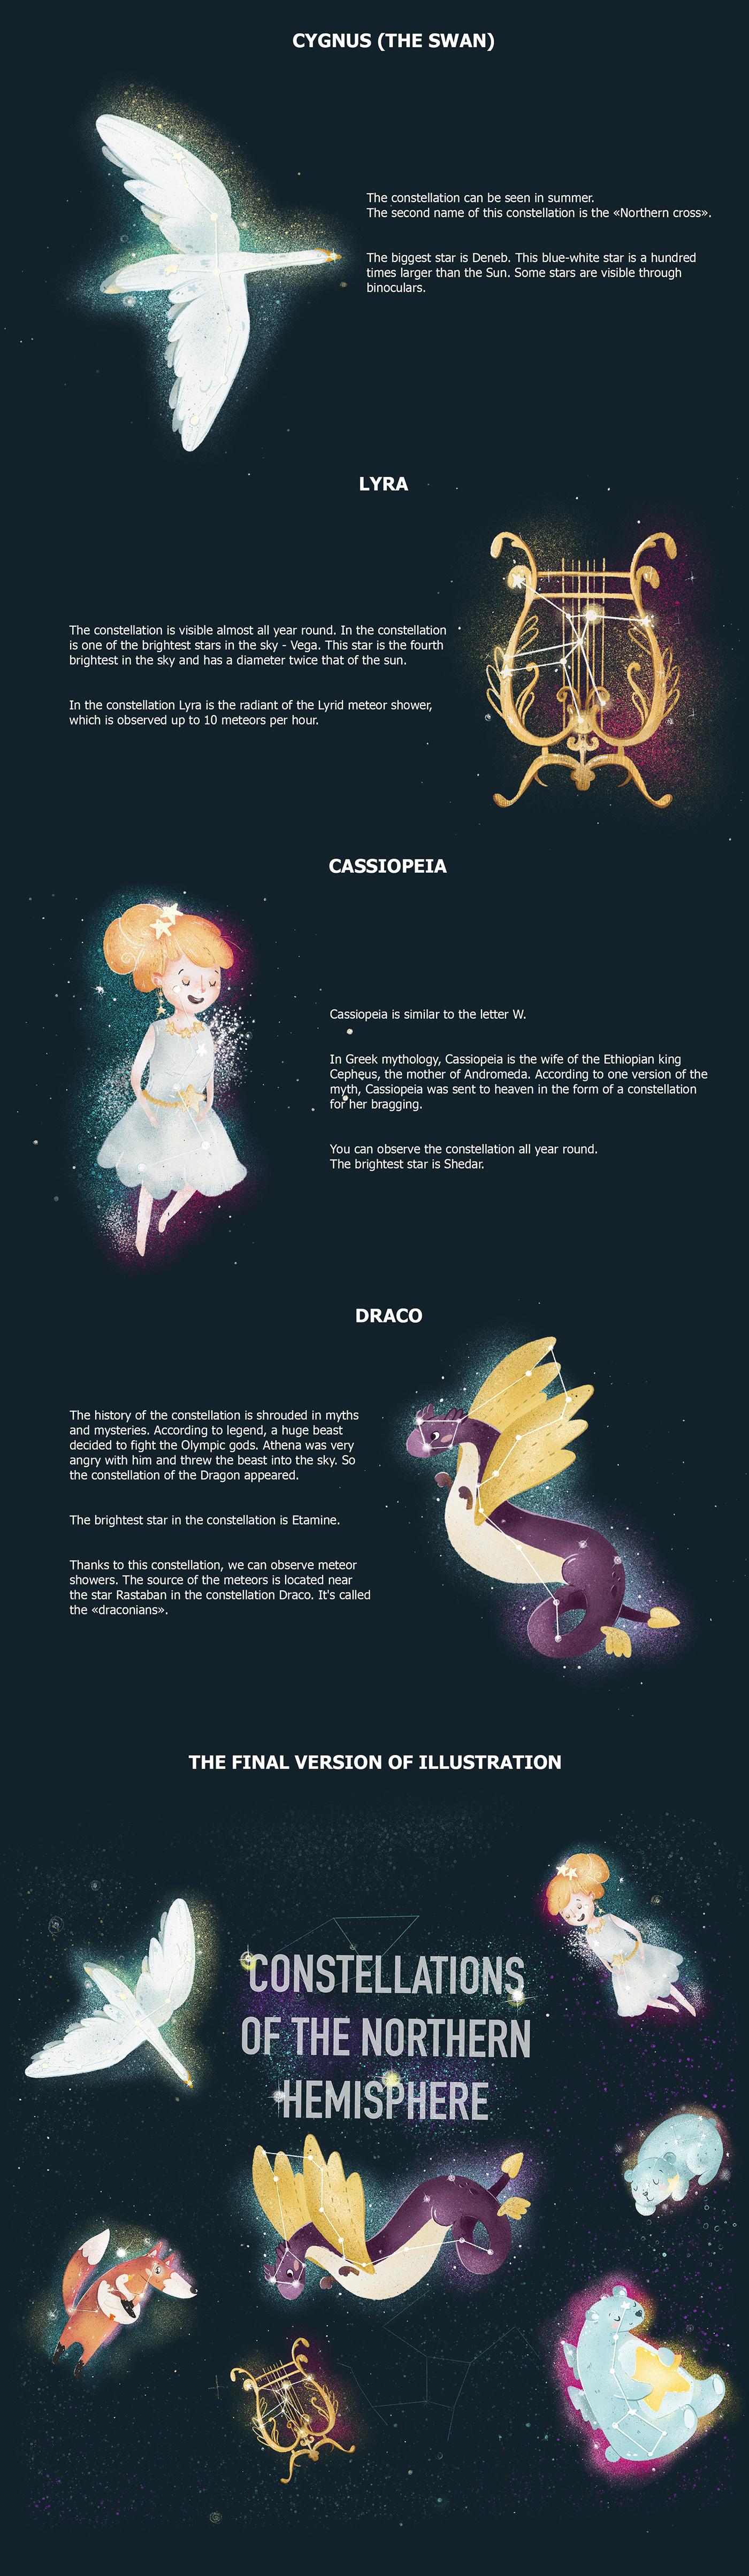 book illustration brand character childrens illustration Digital Art  Education kids illustration